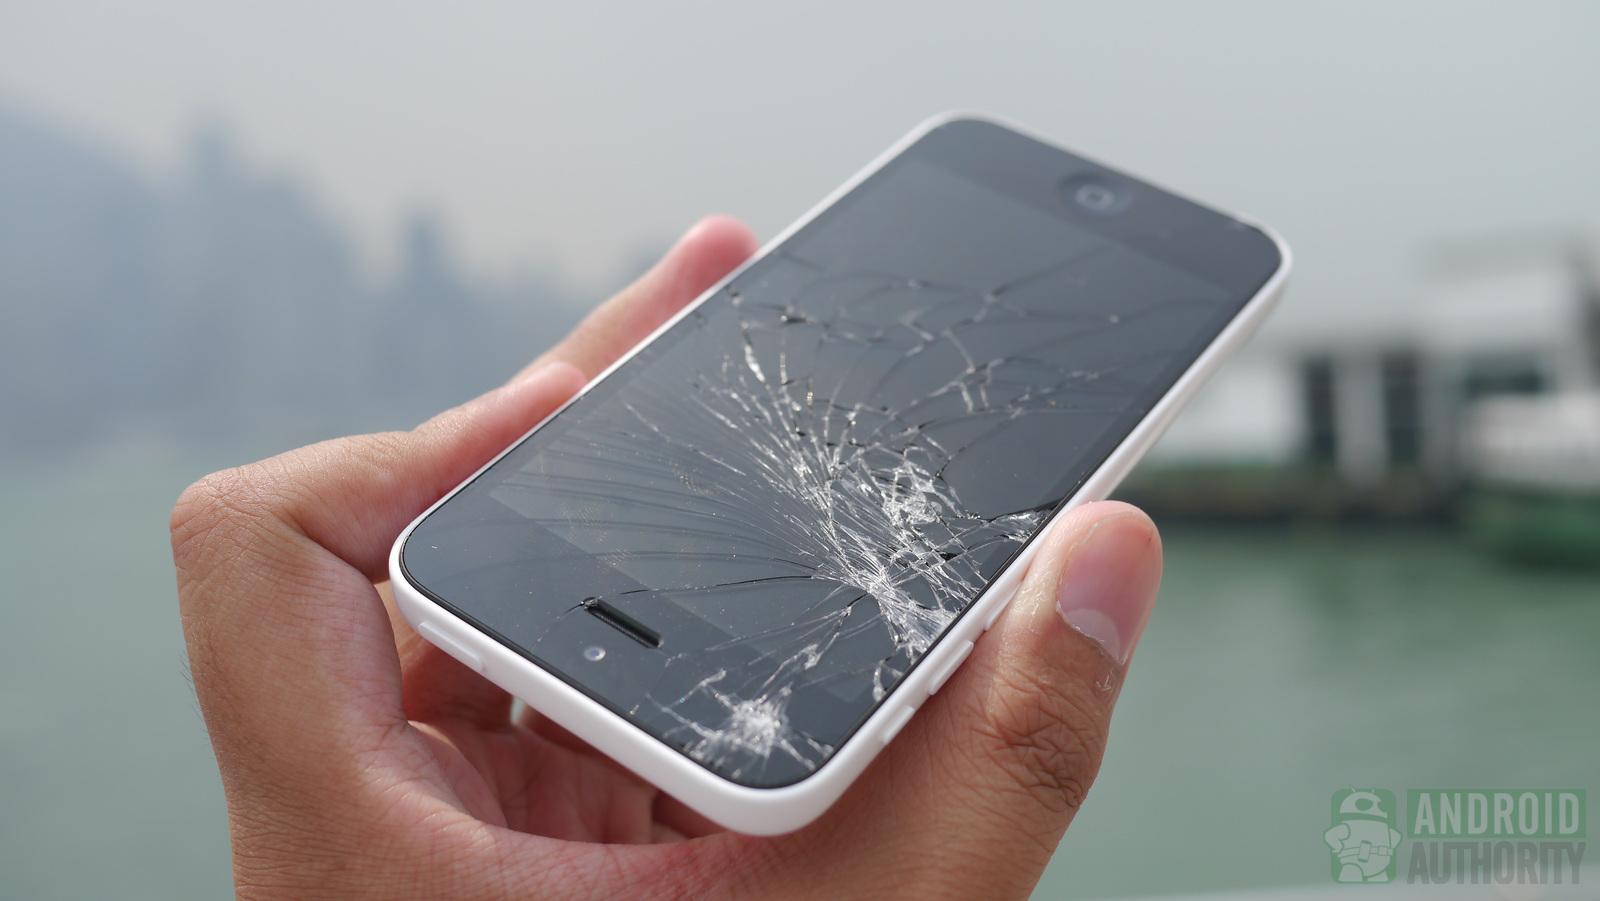 iPhone 5s vs 5c drop test: is Apple's plastic better?